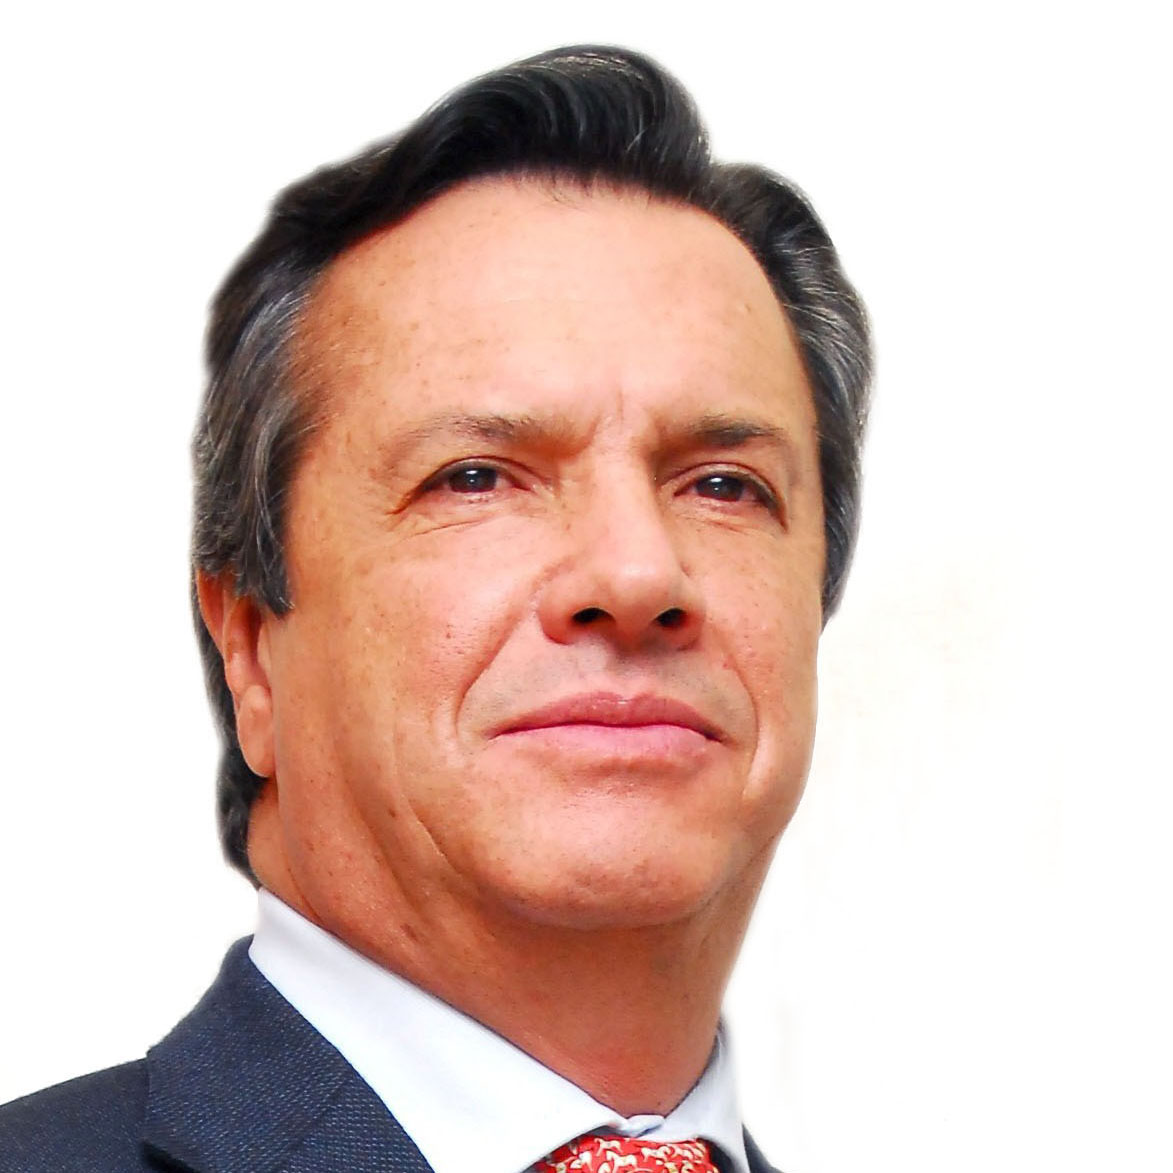 Guillermo Ruiz de Teresa